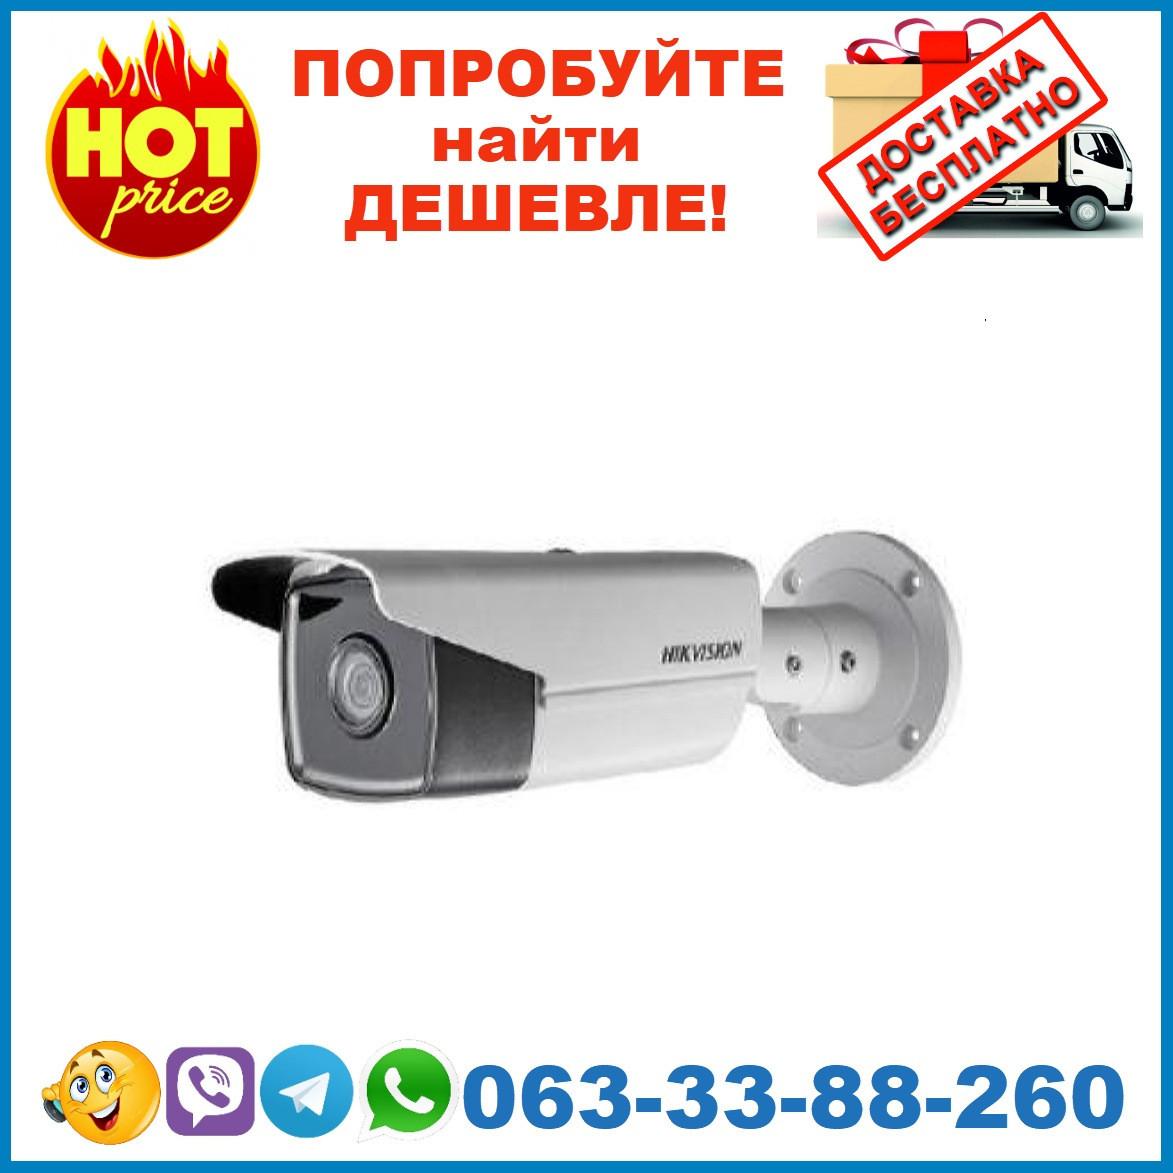 DS-2CD2T23G0-I8 (8 мм)  2Мп IP видеокамера Hikvision